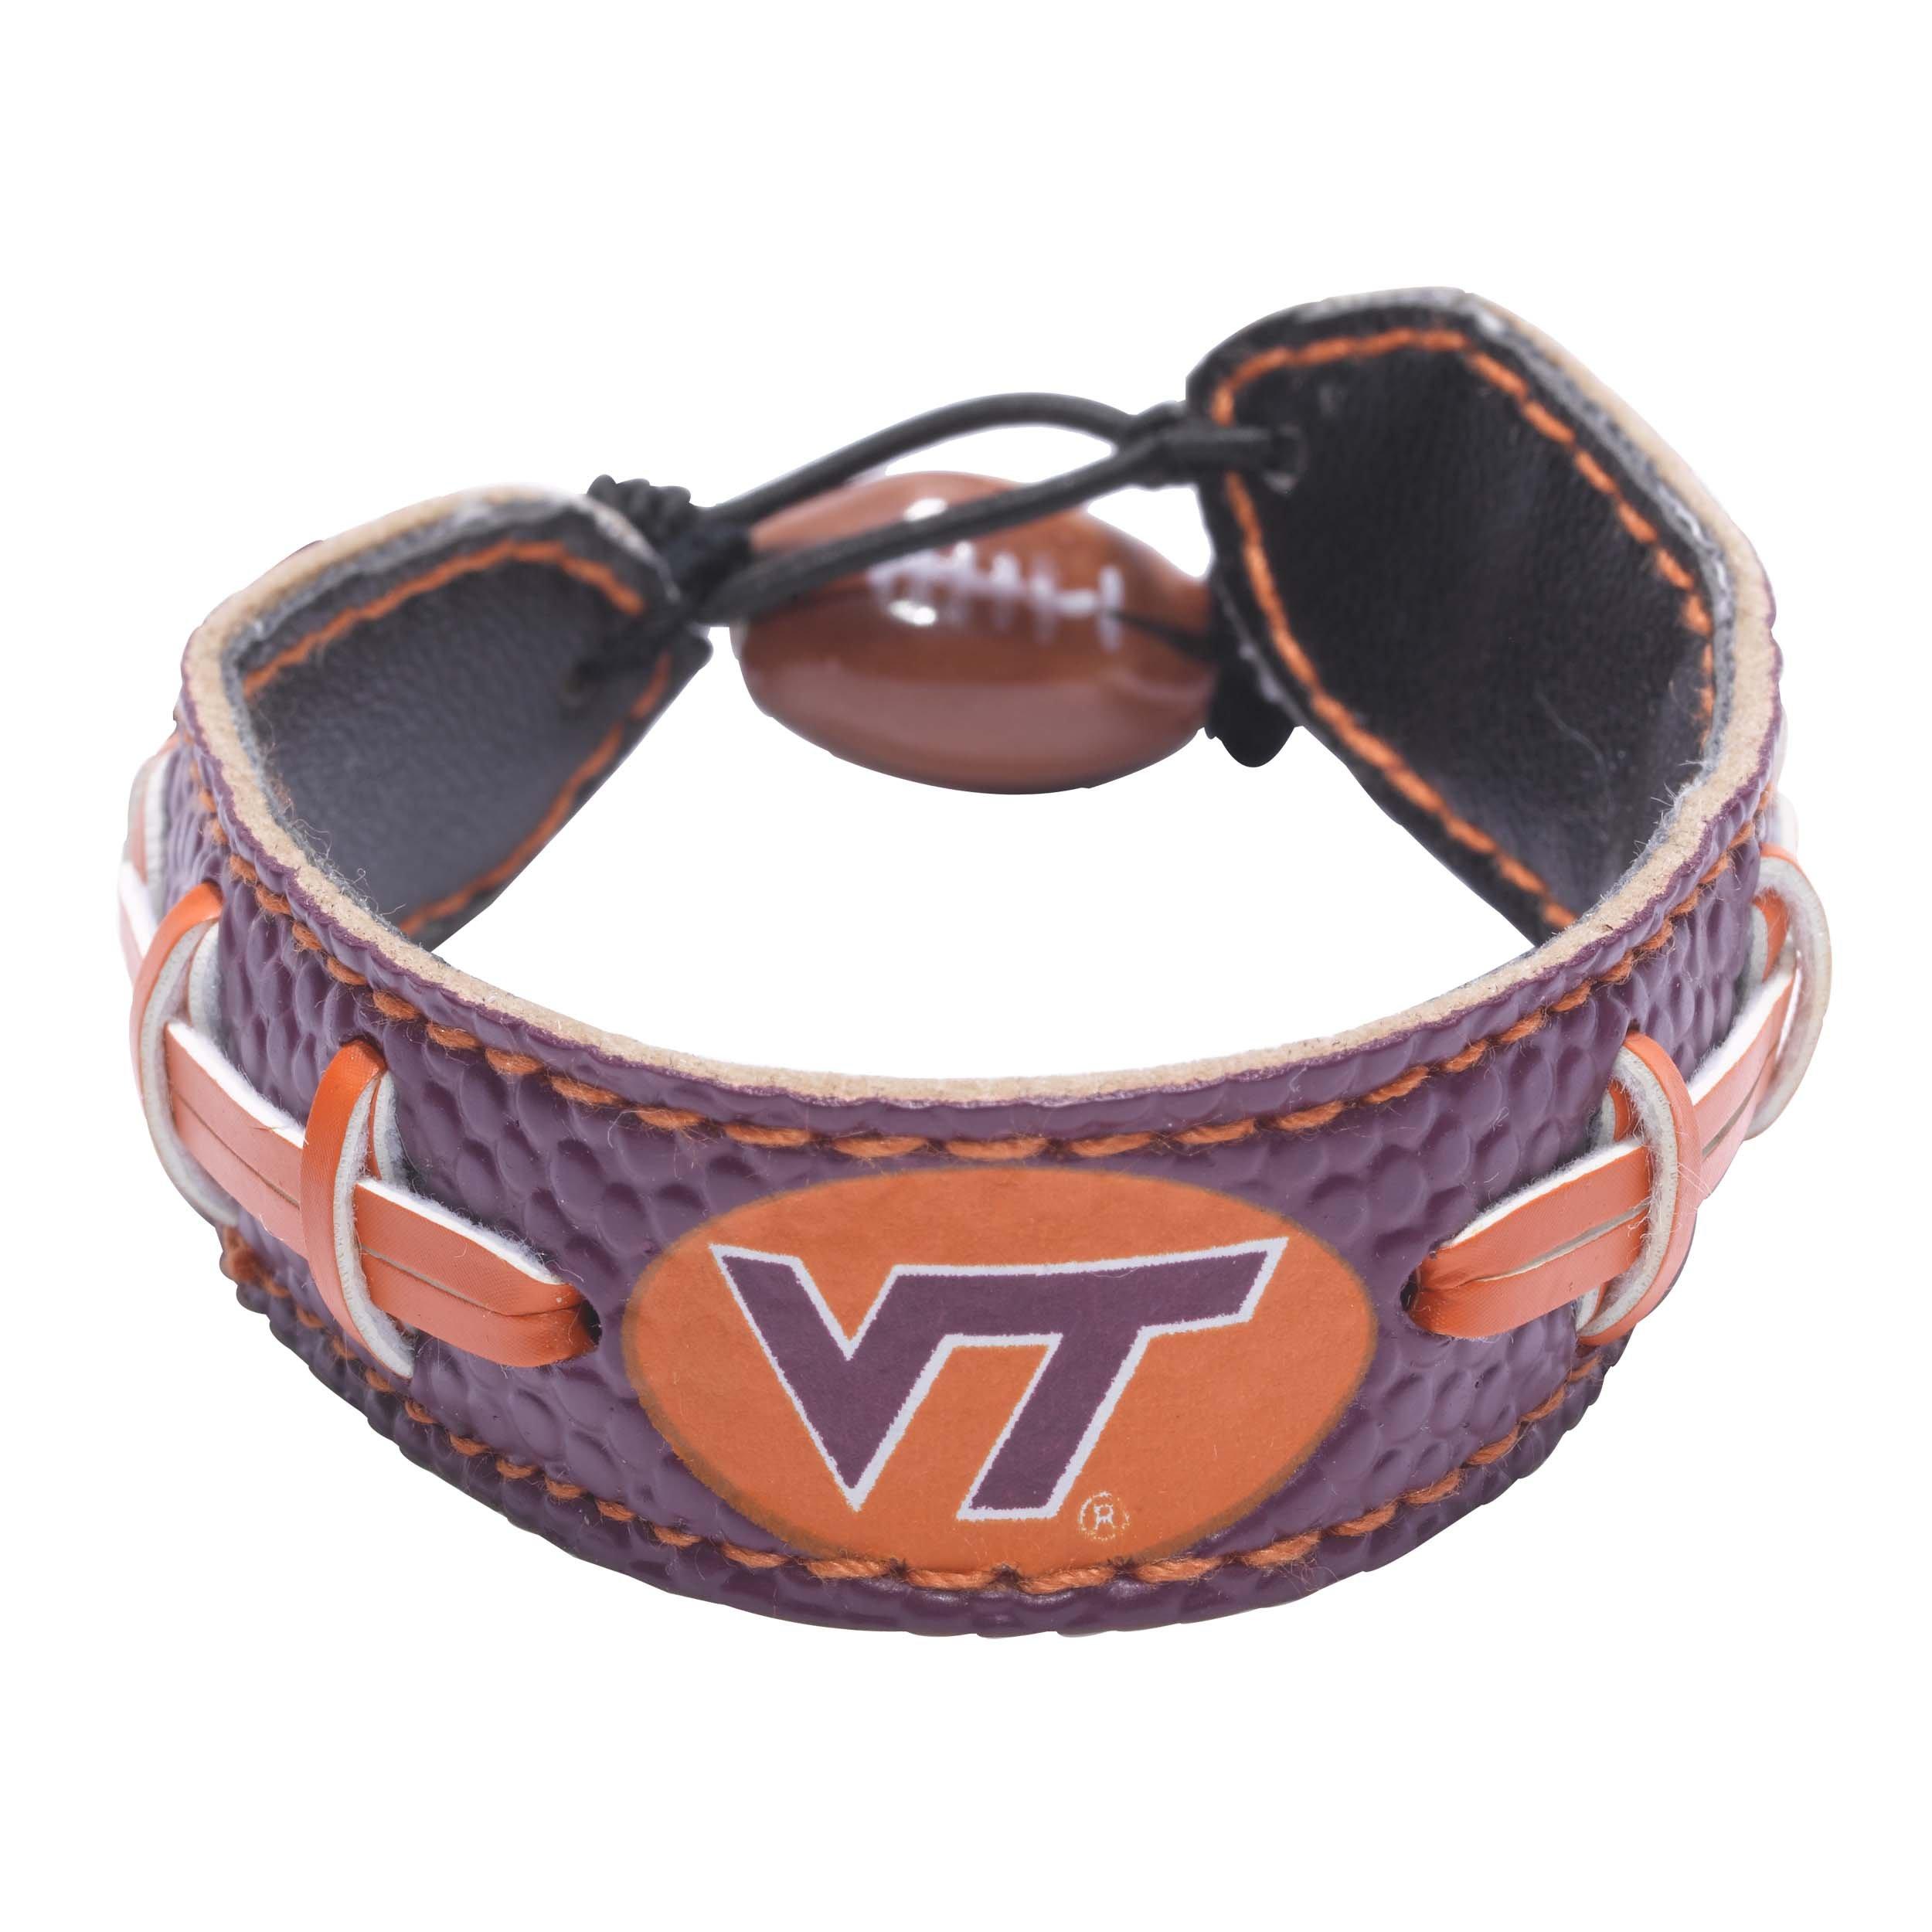 Virginia Tech Hokies Team Color Football Bracelet